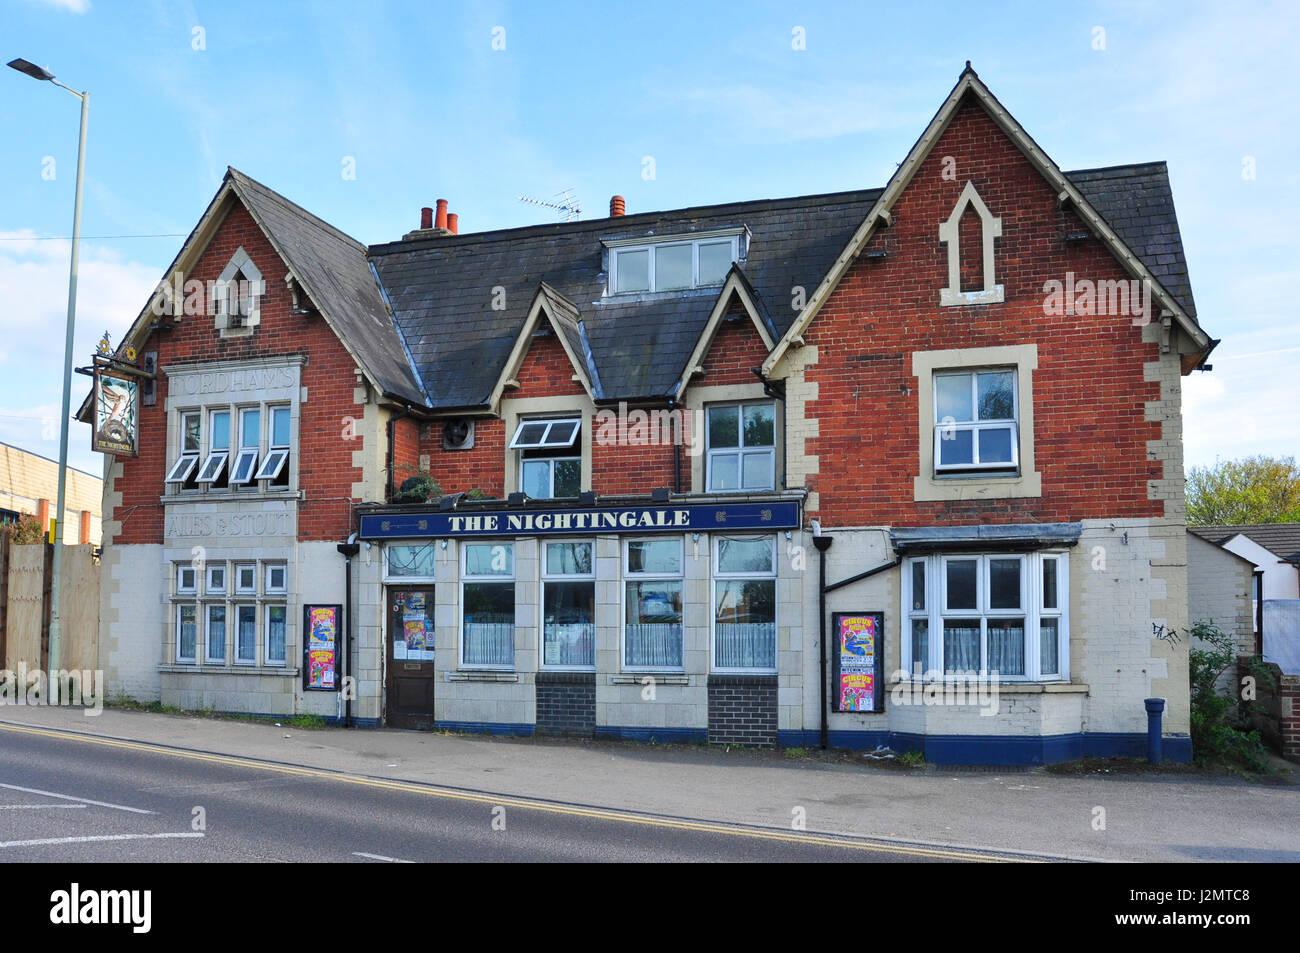 The Nightingale, (Leicester Railway inn from c1857), Nightingale Road, Hitchin, Hertfordshire, England, UK - Stock Image